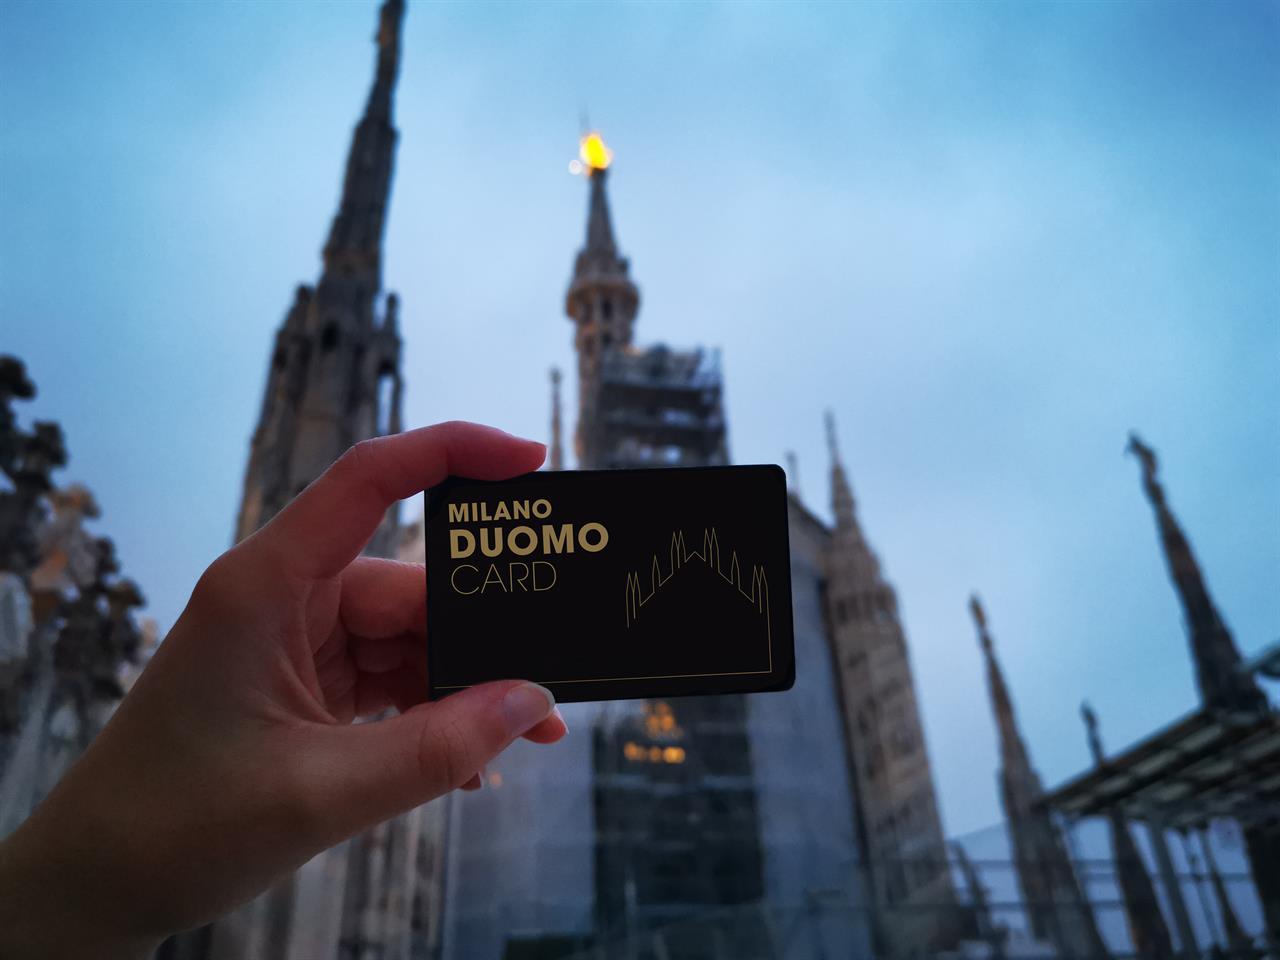 Milano Duomo Card 2 © Veneranda Fabbrica Del Duomo Di Milano